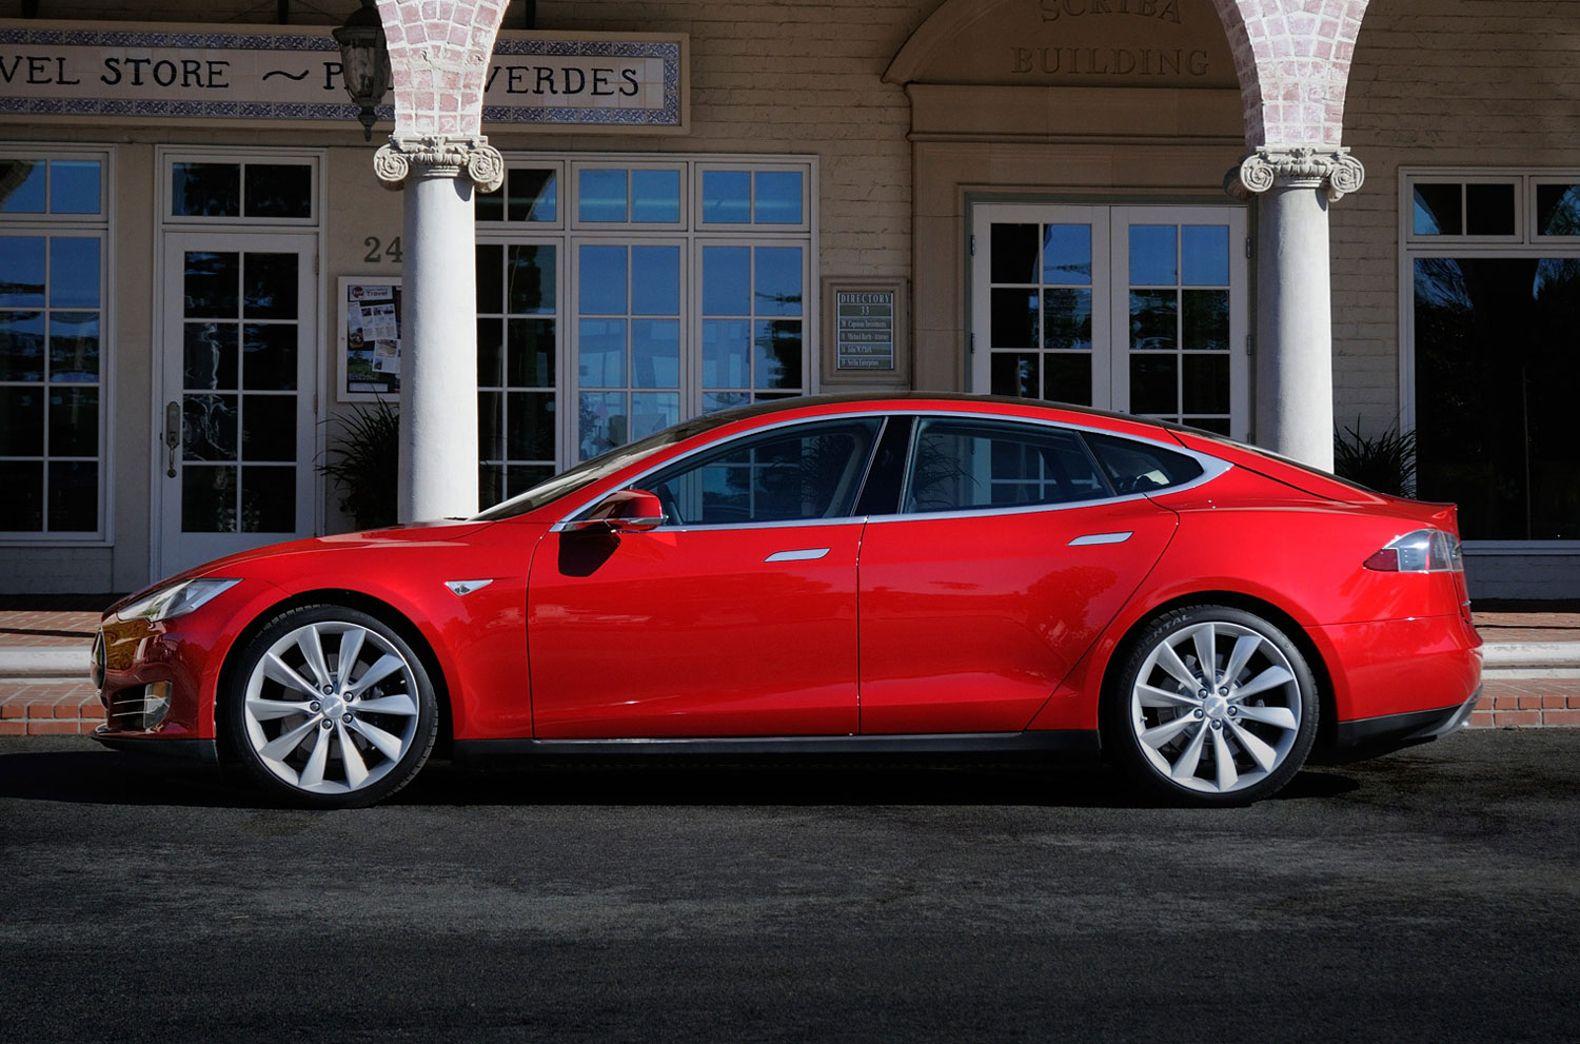 Elon Musk To Personally Hire Software Pros For Tesla S Fully Driverless Cars Tesla Model S Tesla Motors Tesla Model